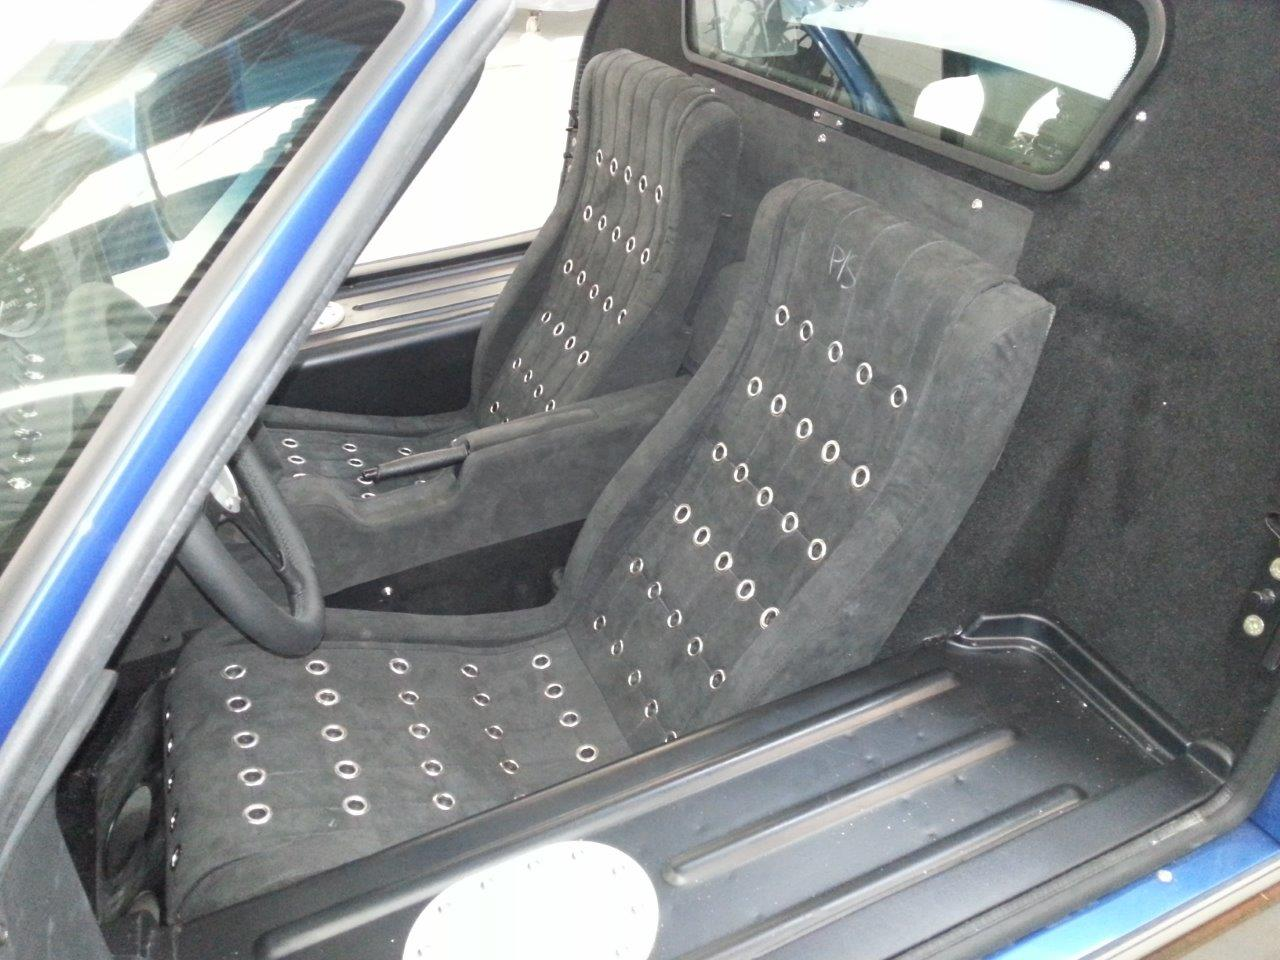 Superformance GT40 MKII For Sale-250-s1342-p2318-gt-40-mk-ii-shelby-guardsman-blue-wimbledon-white-15-jpg